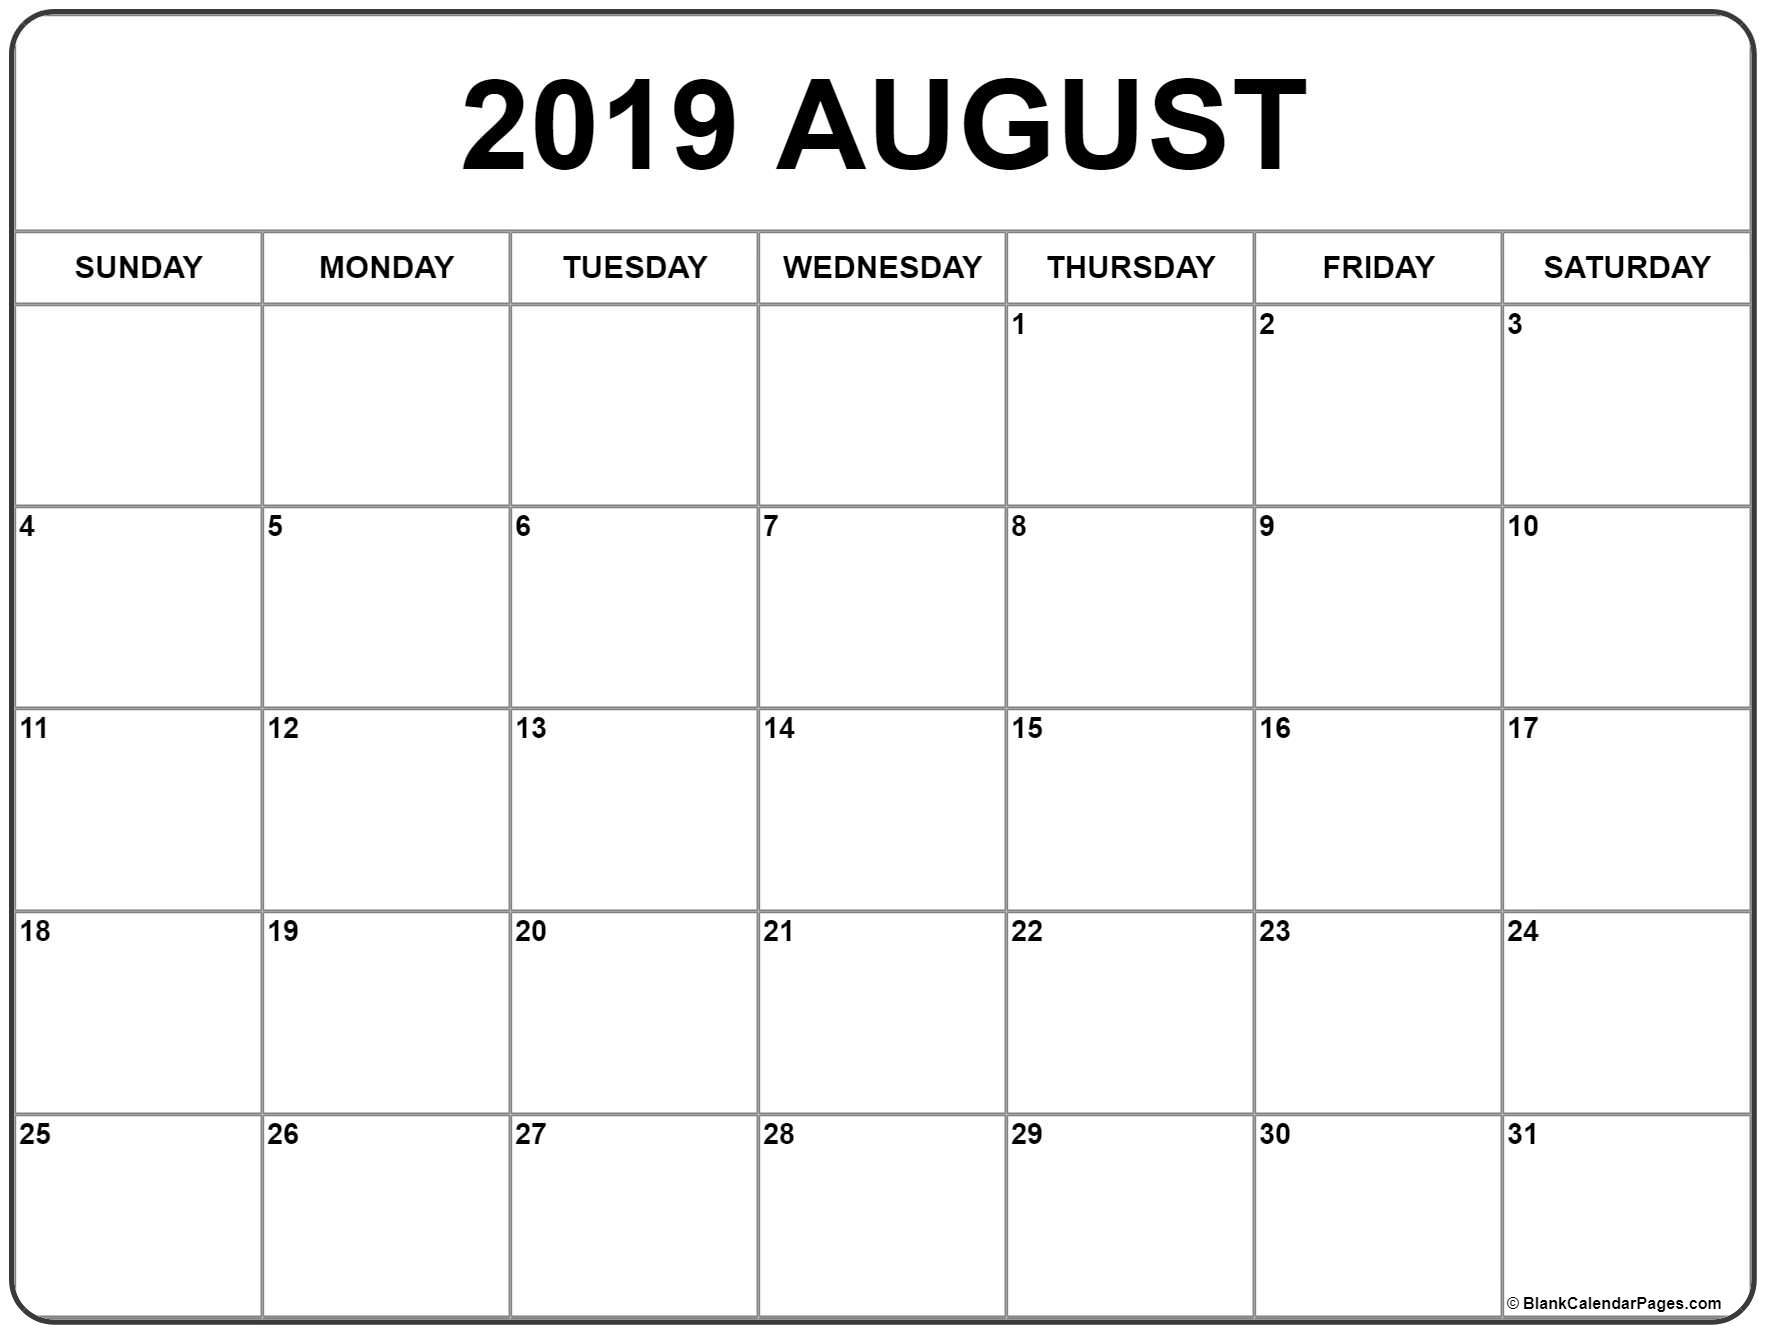 August 2019 Calendar | Free Printable Monthly Calendars for Printable Calendar 2019 2020 Write On